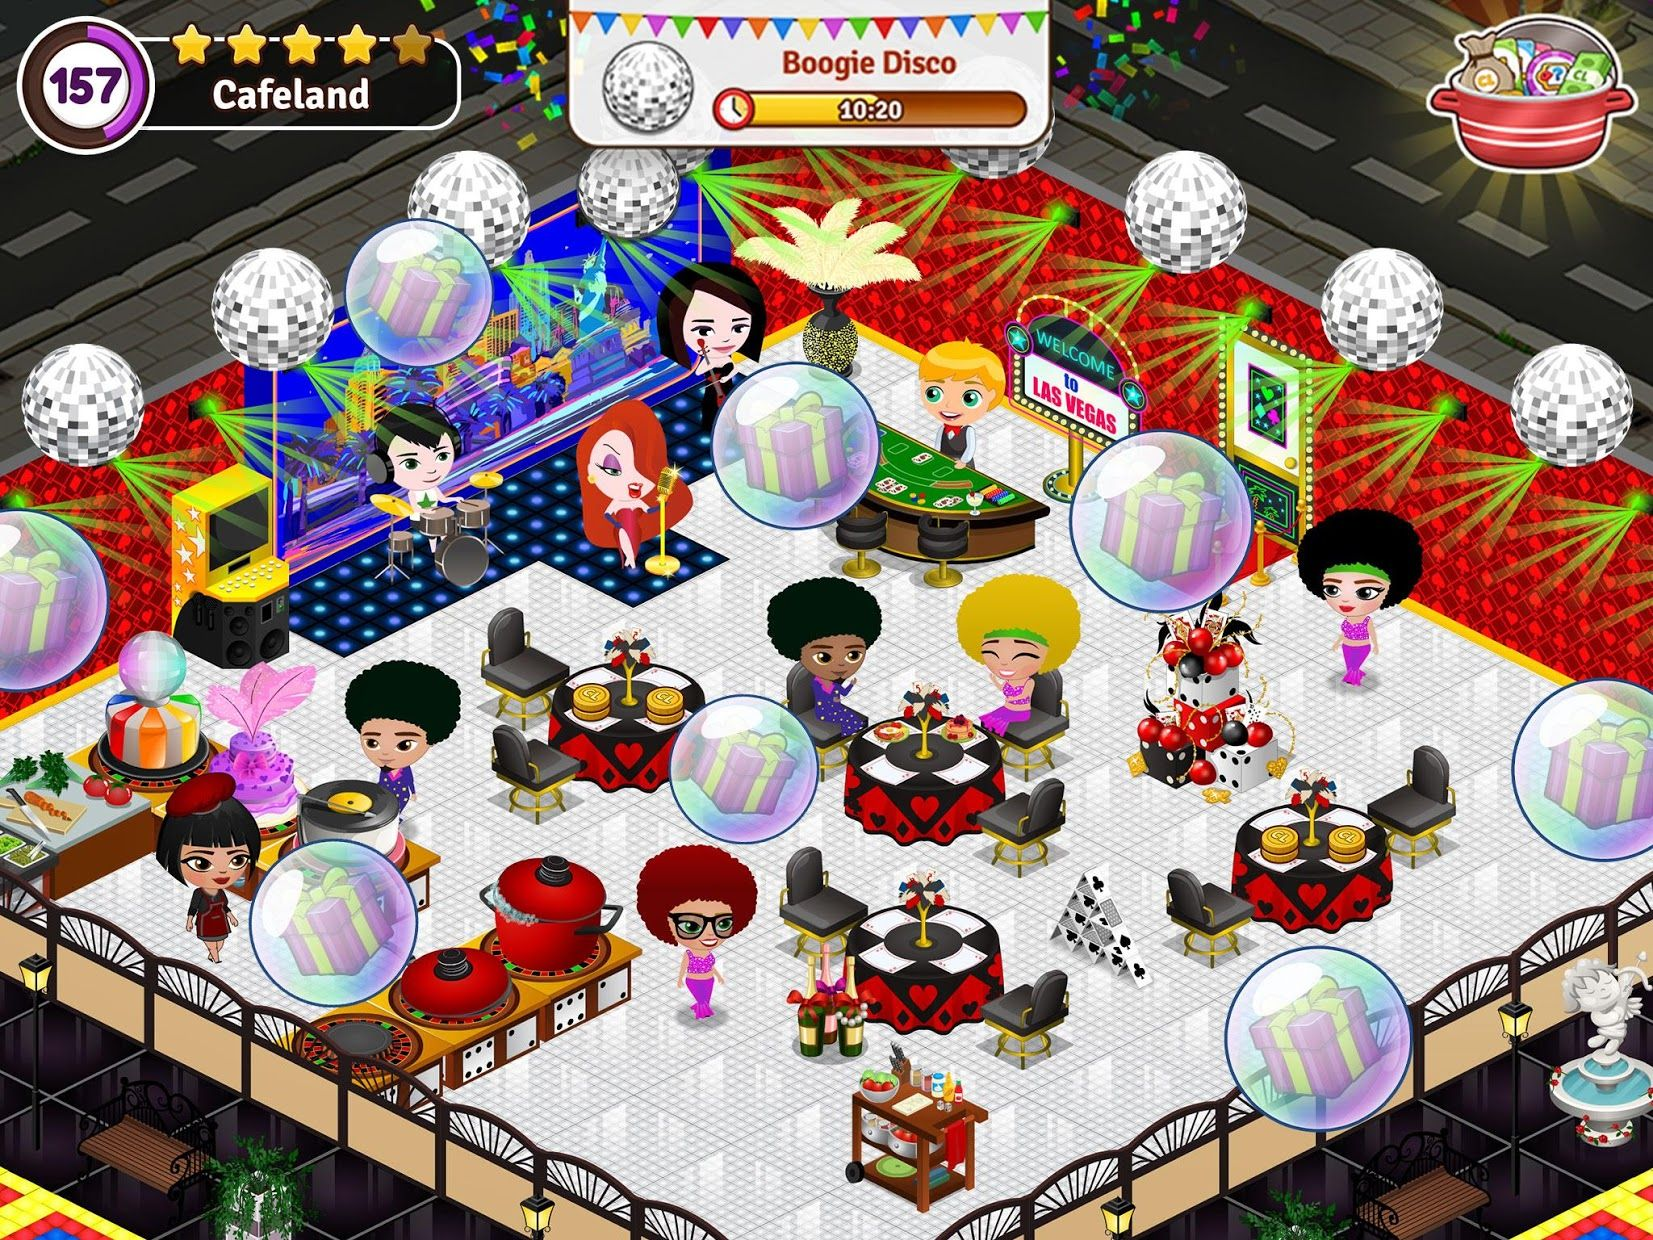 Cafeland - 餐厅游戏 游戏截图5